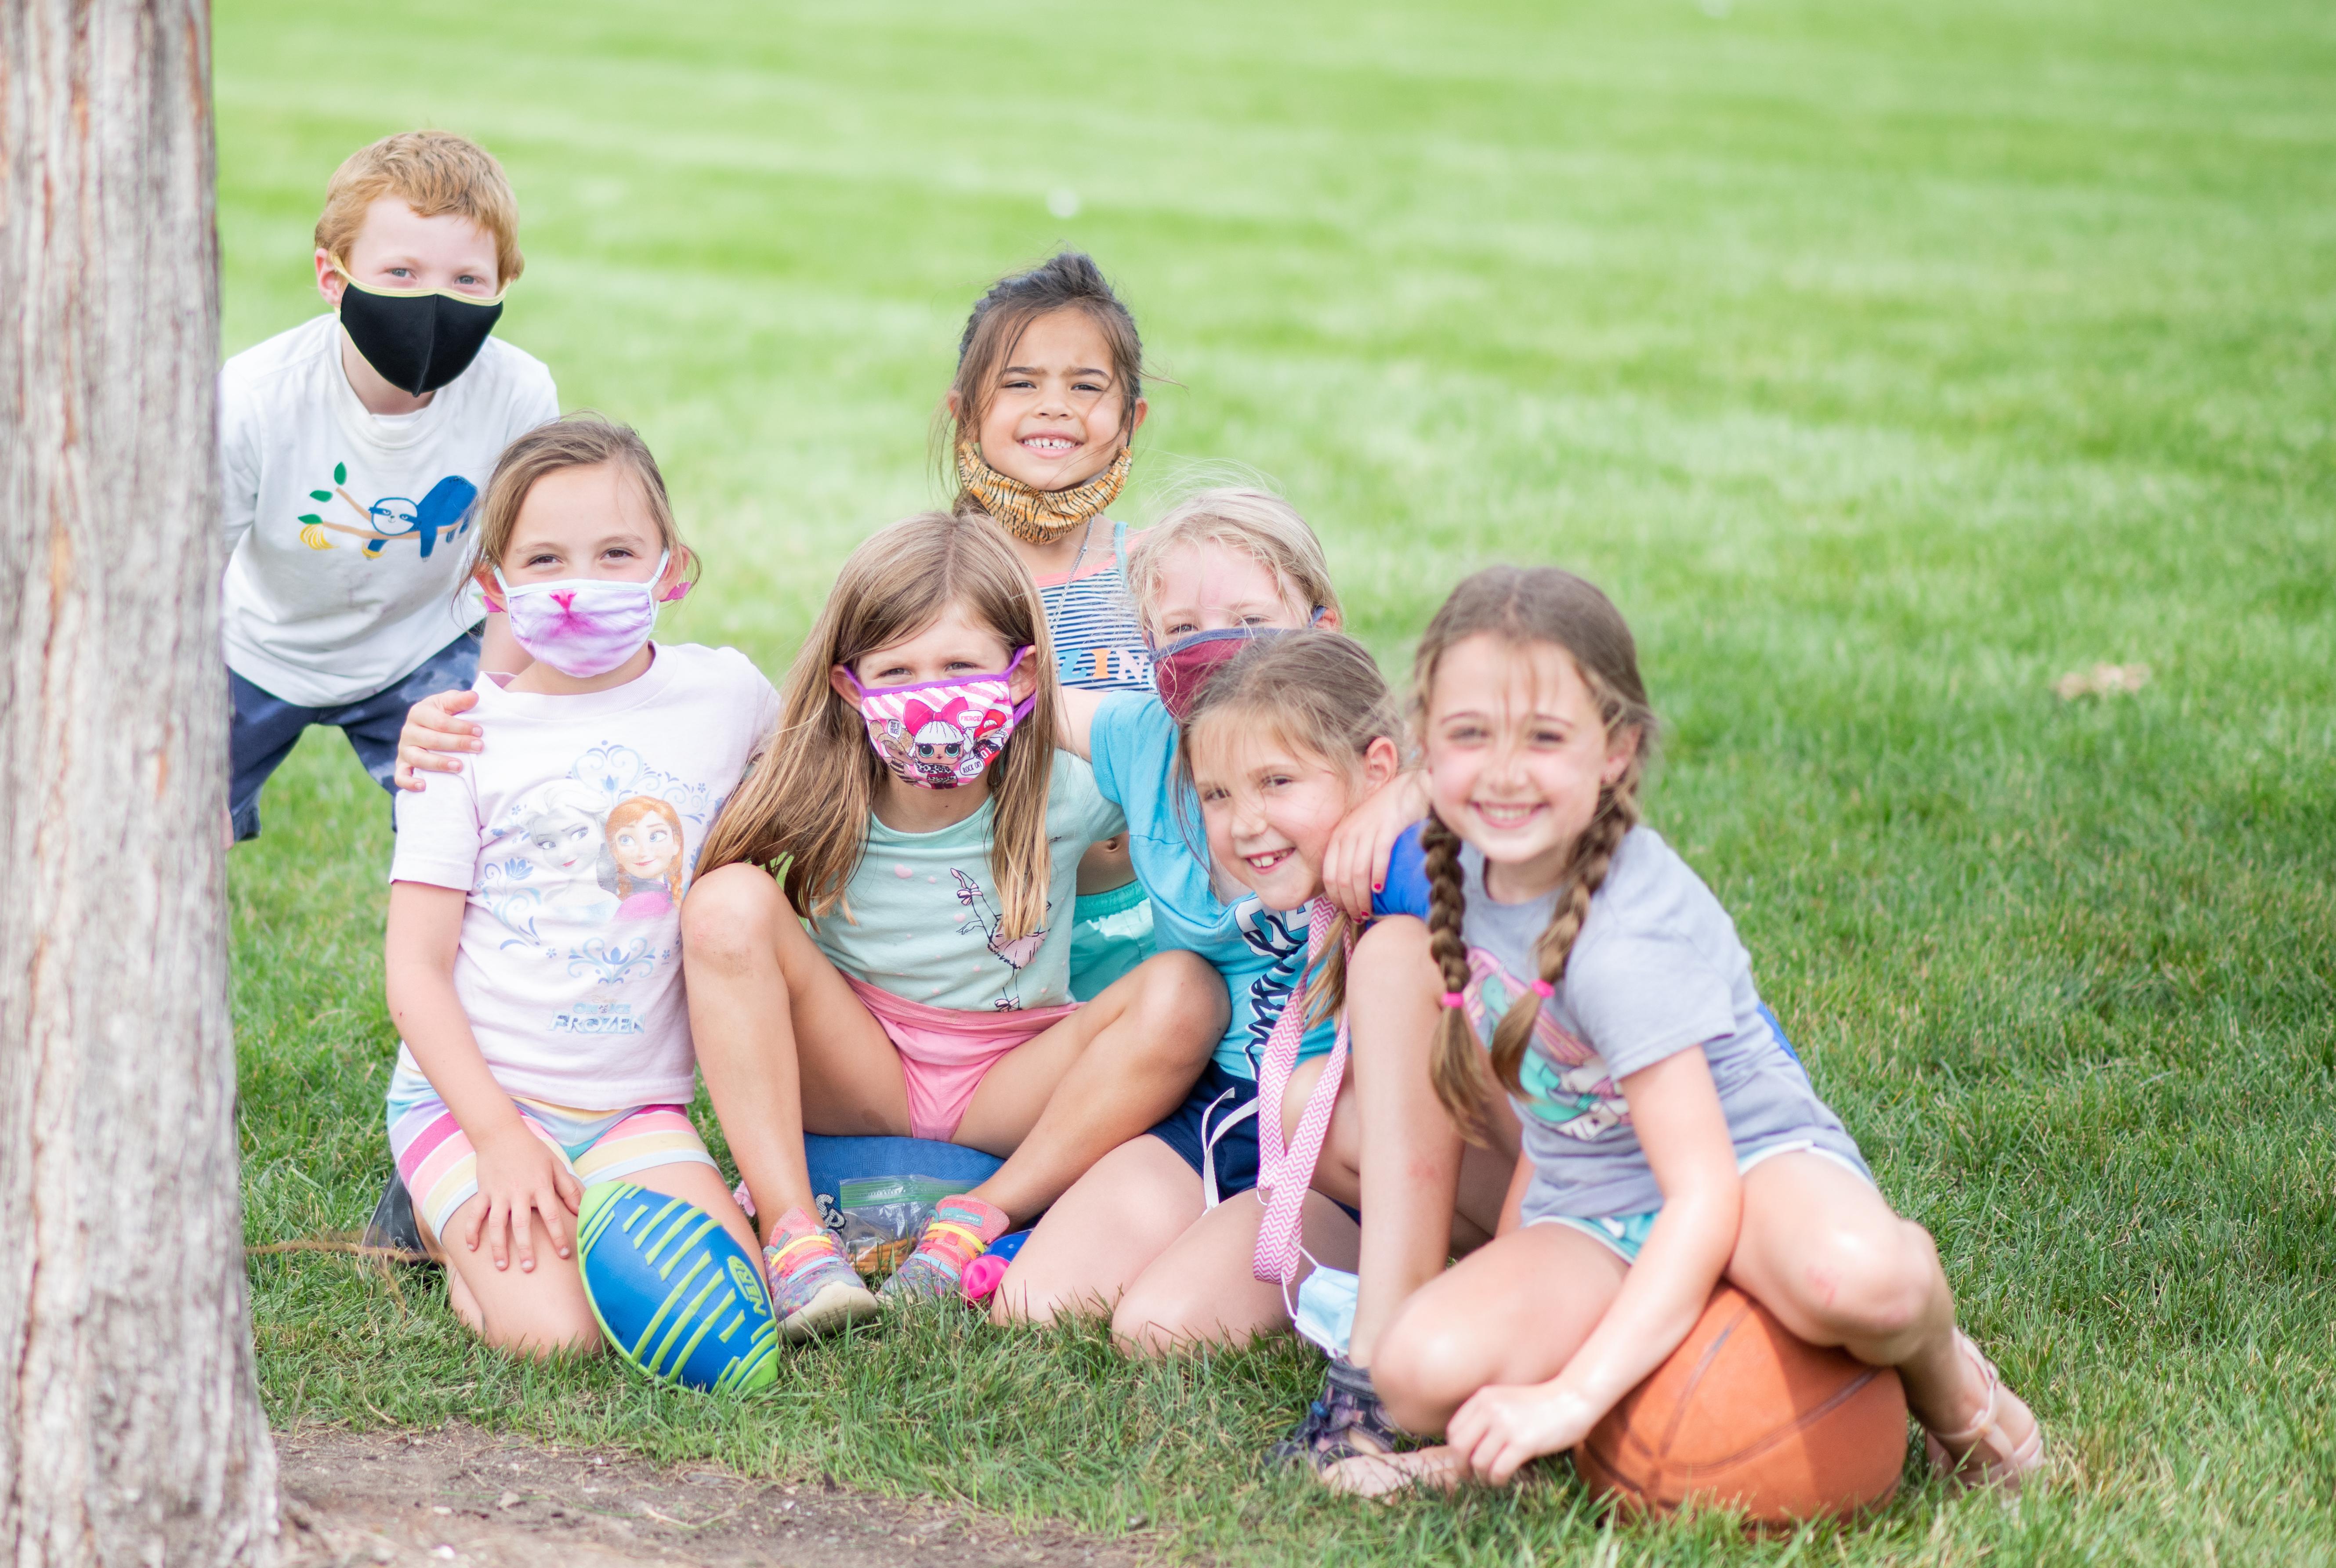 Summer Camp Series in Carmel, Indiana